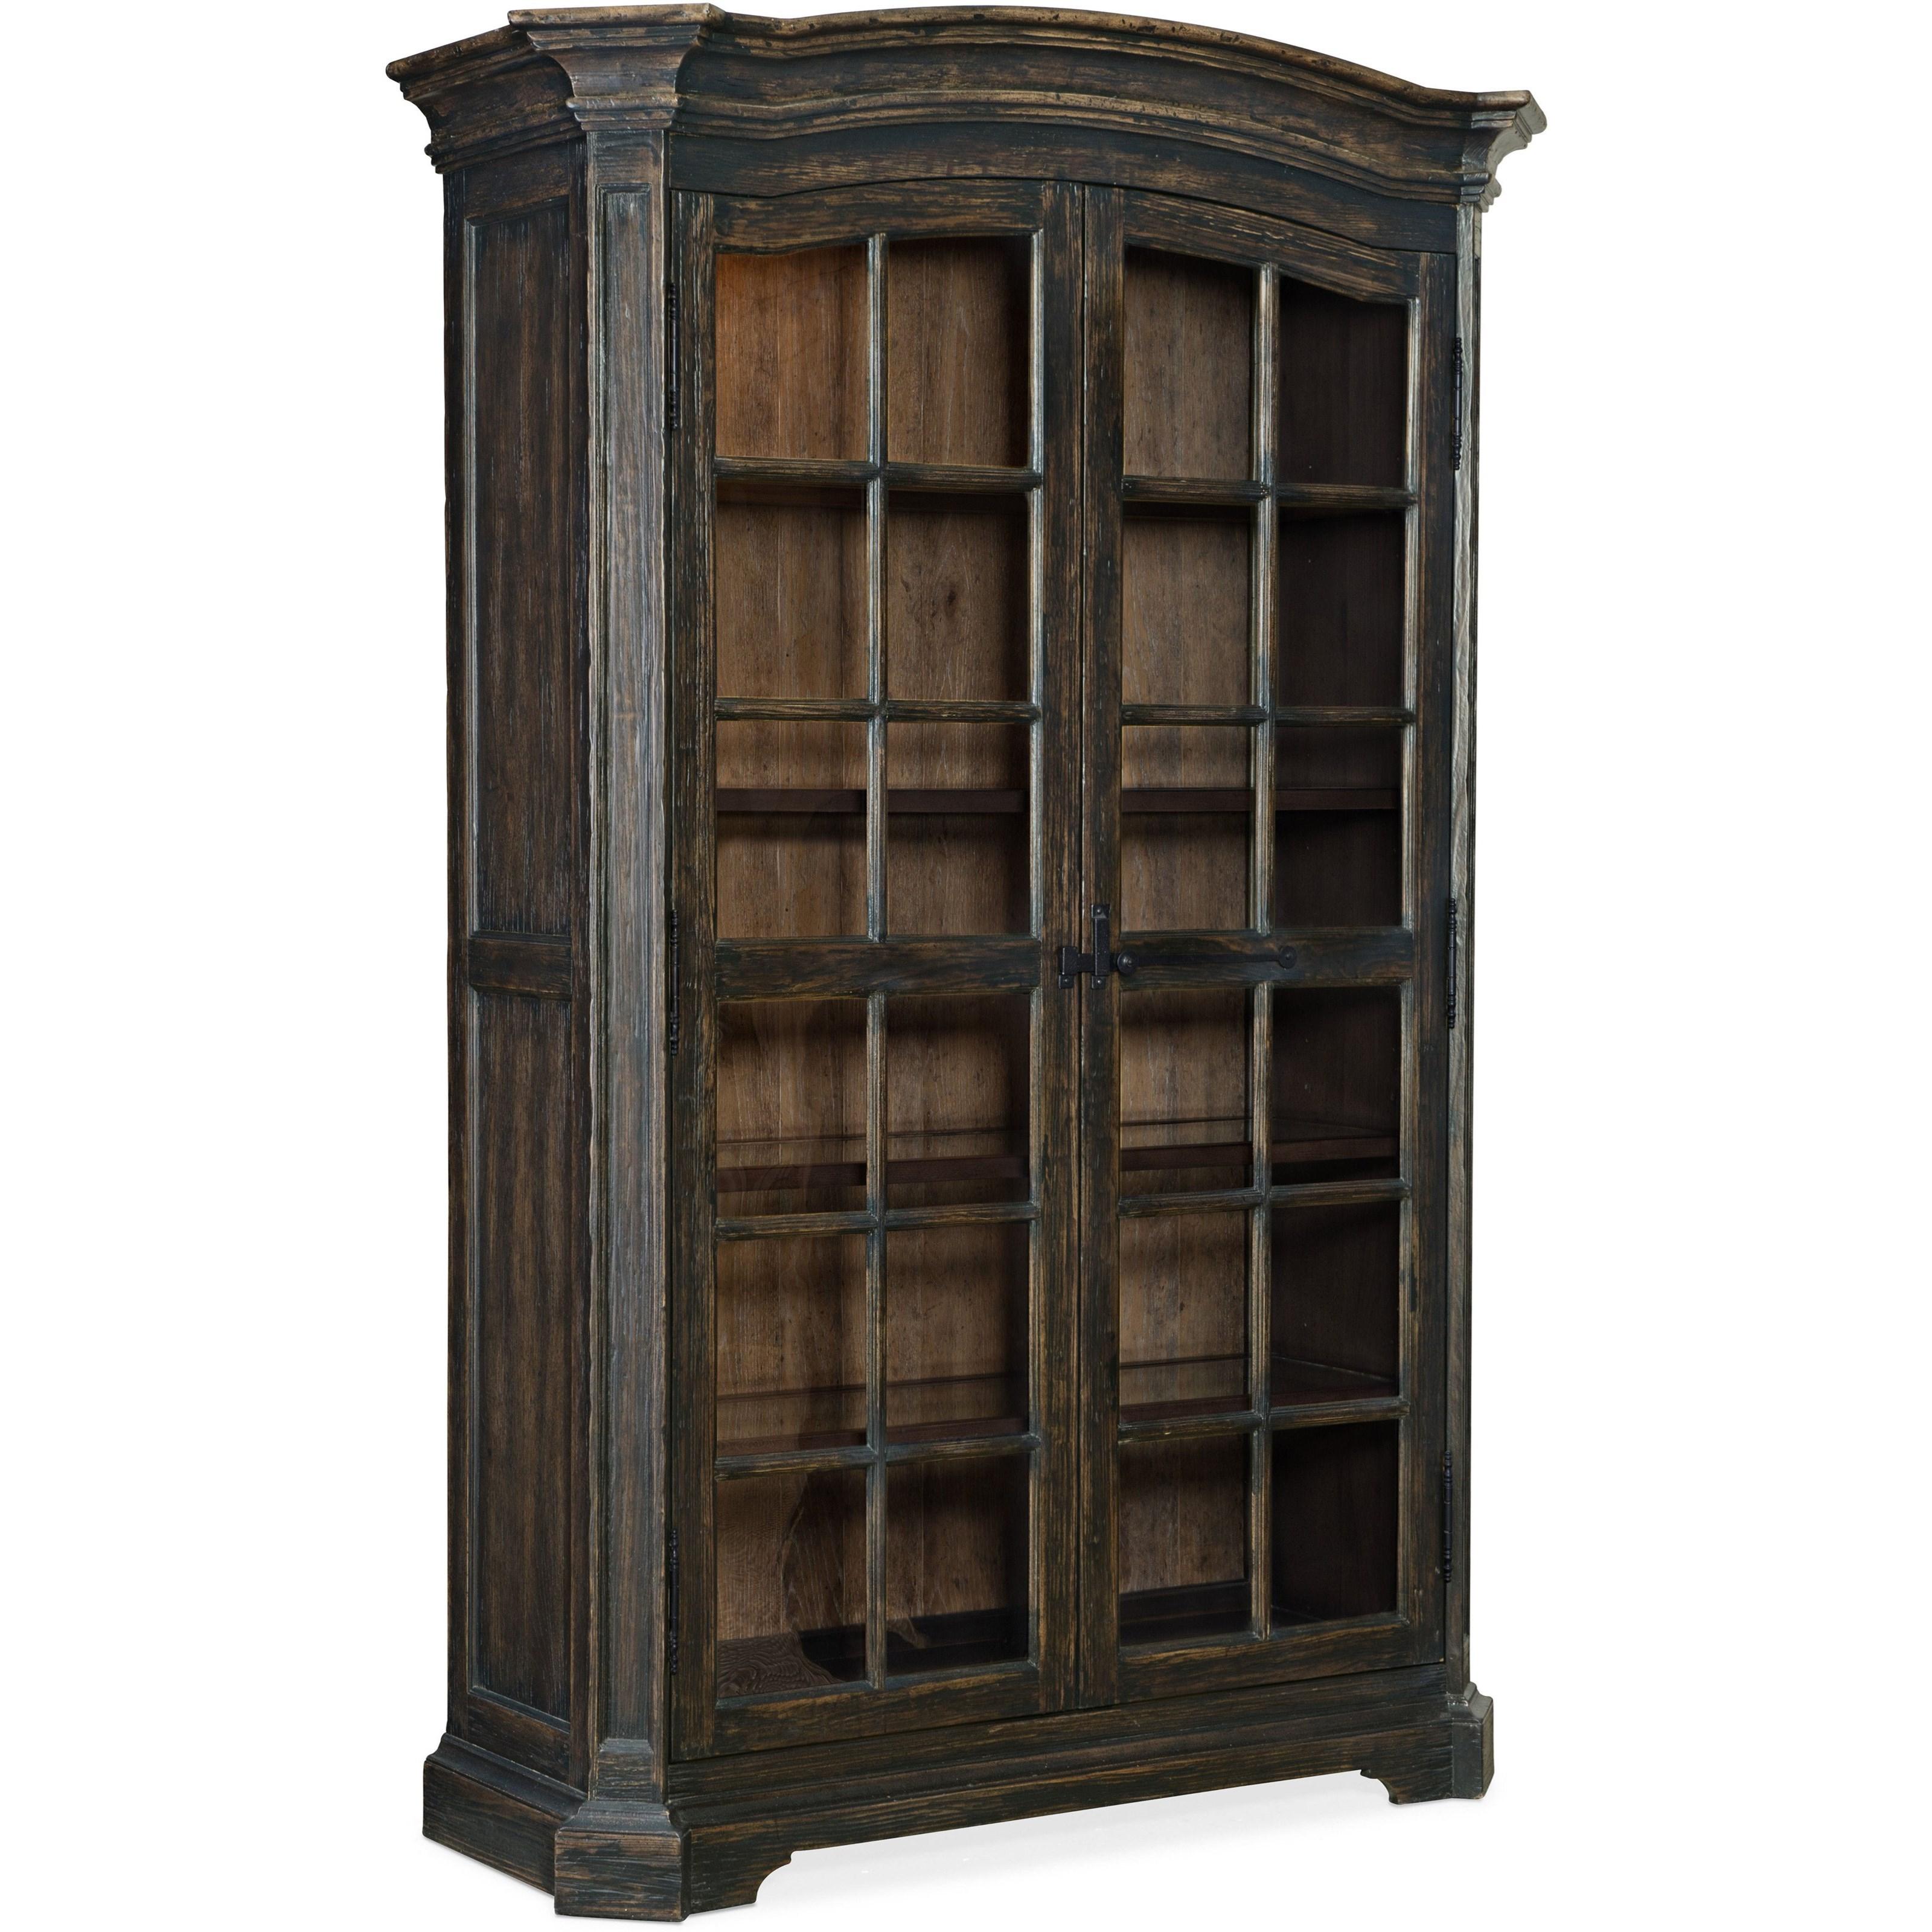 La Grange Mullins Prairie Display Cabinet by Hooker Furniture at Alison Craig Home Furnishings